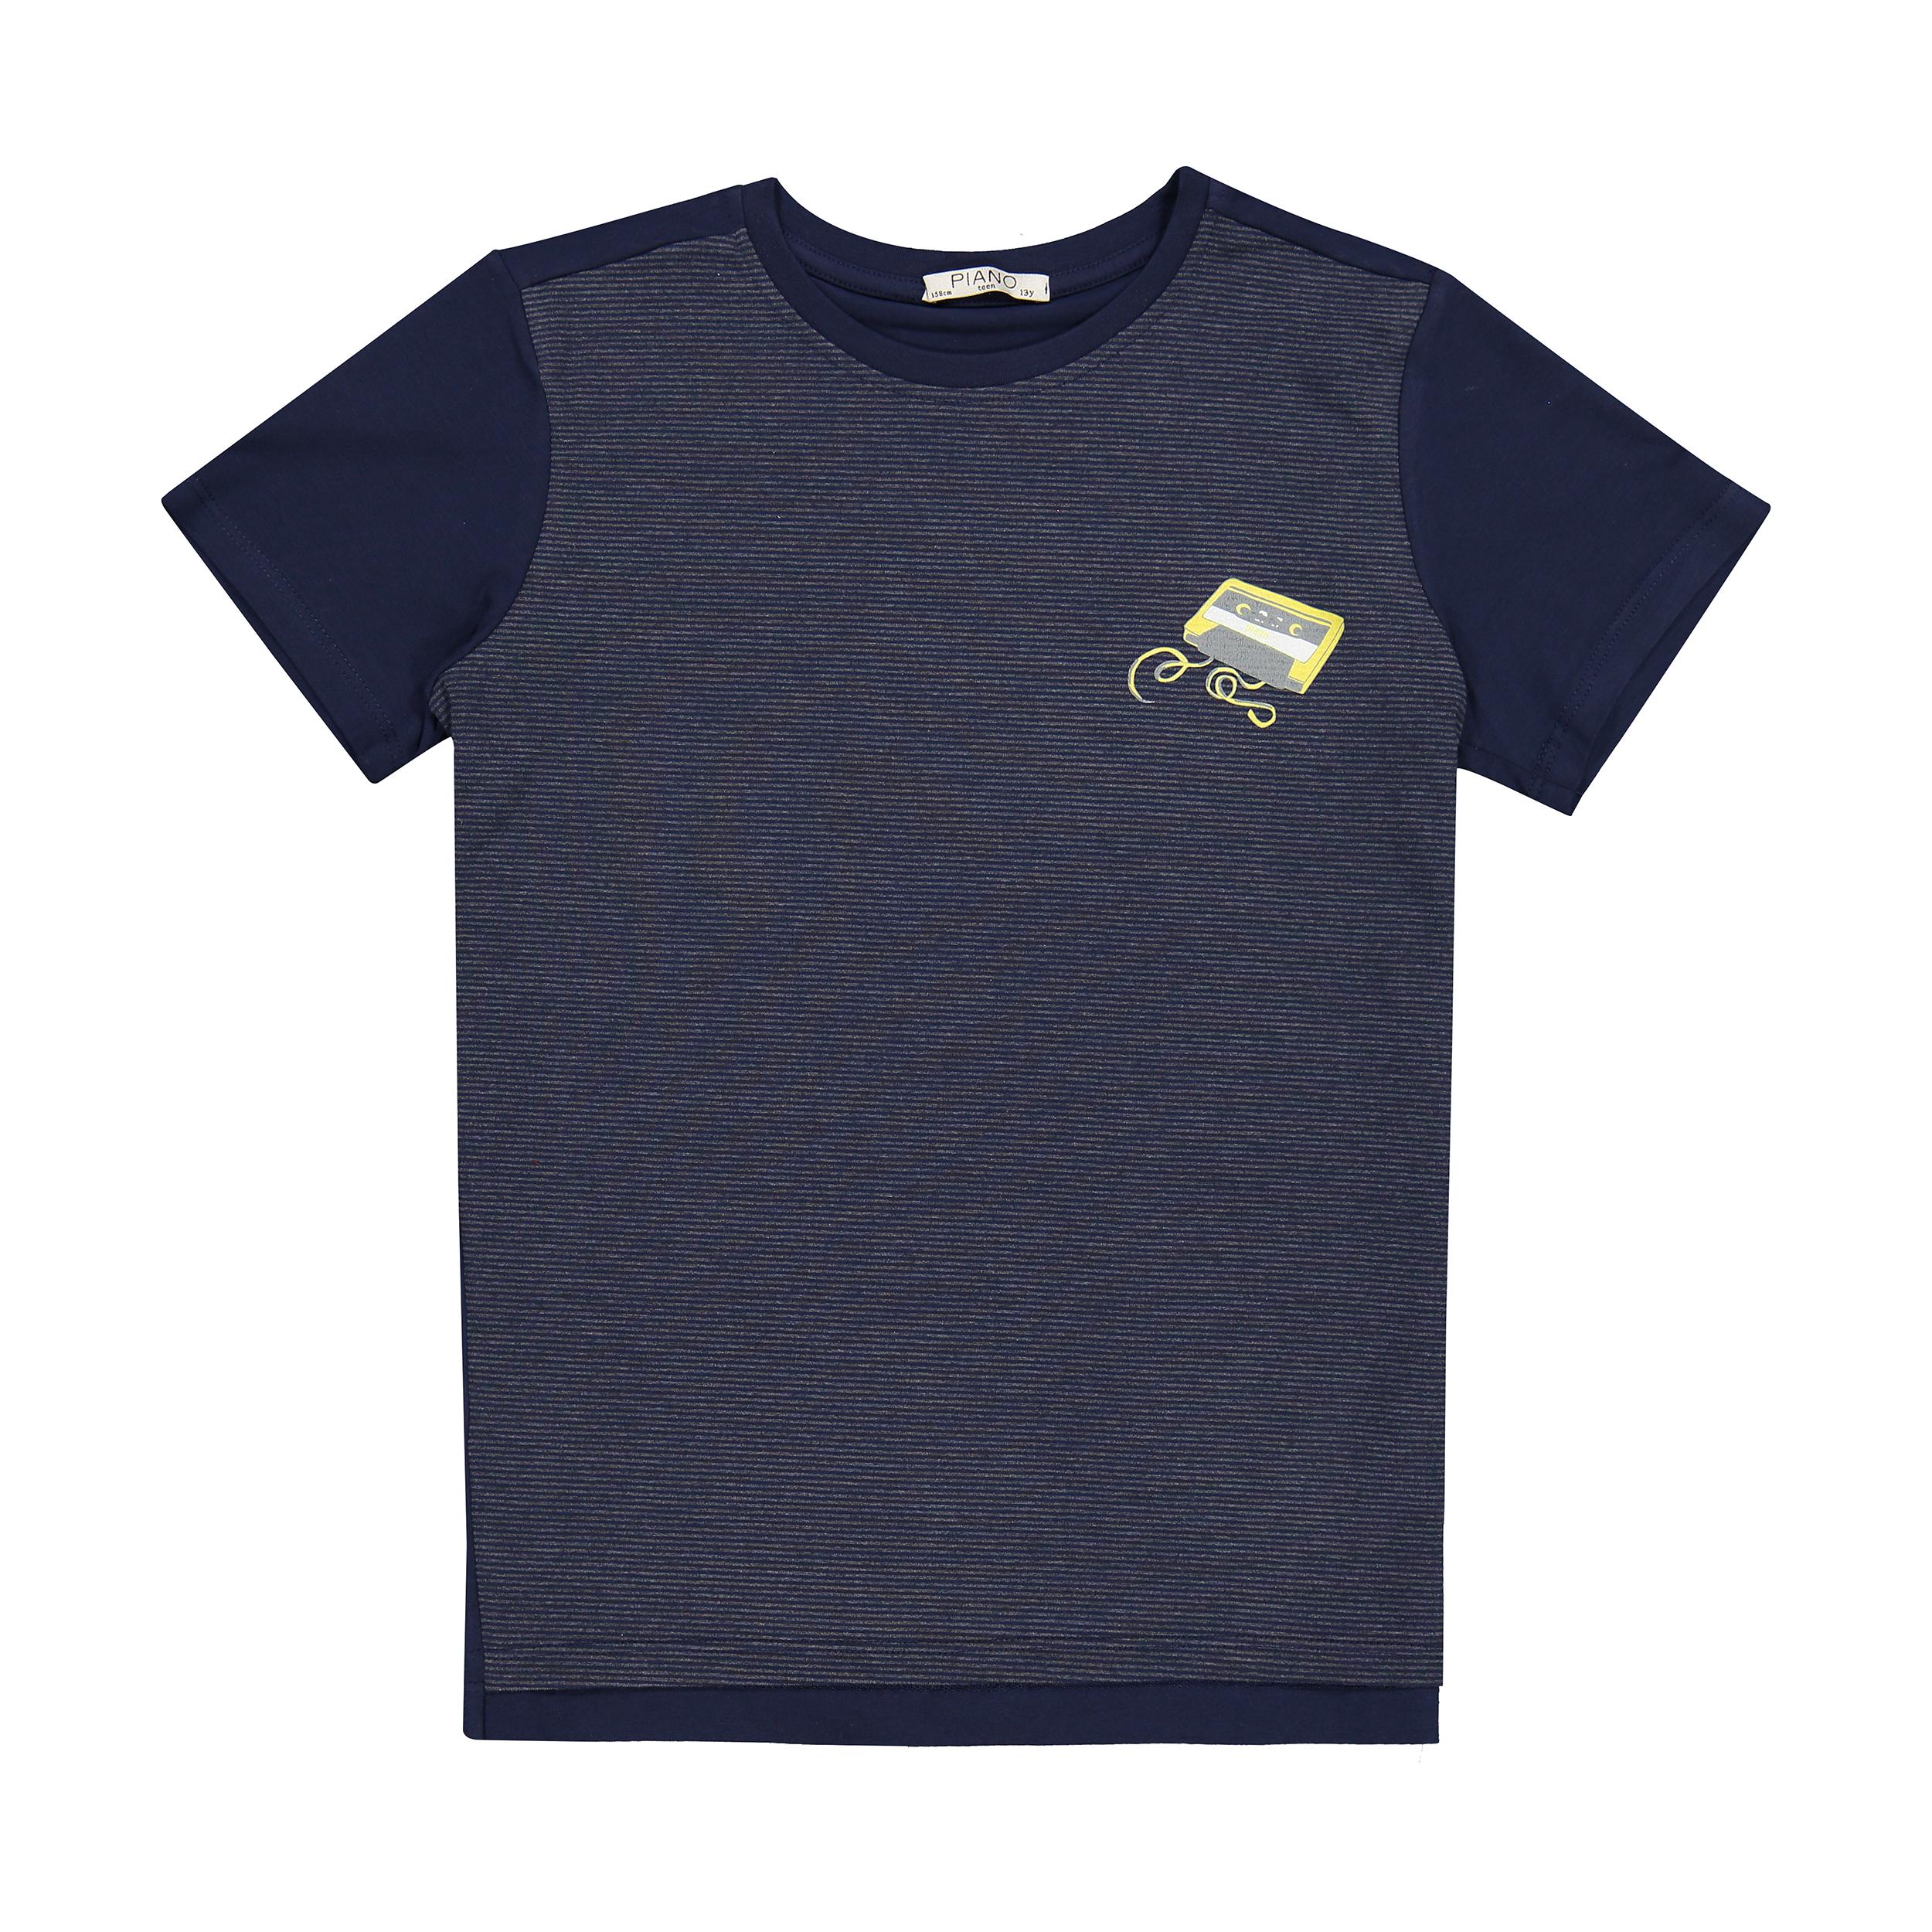 تی شرت پسرانه پیانو مدل 01523-59